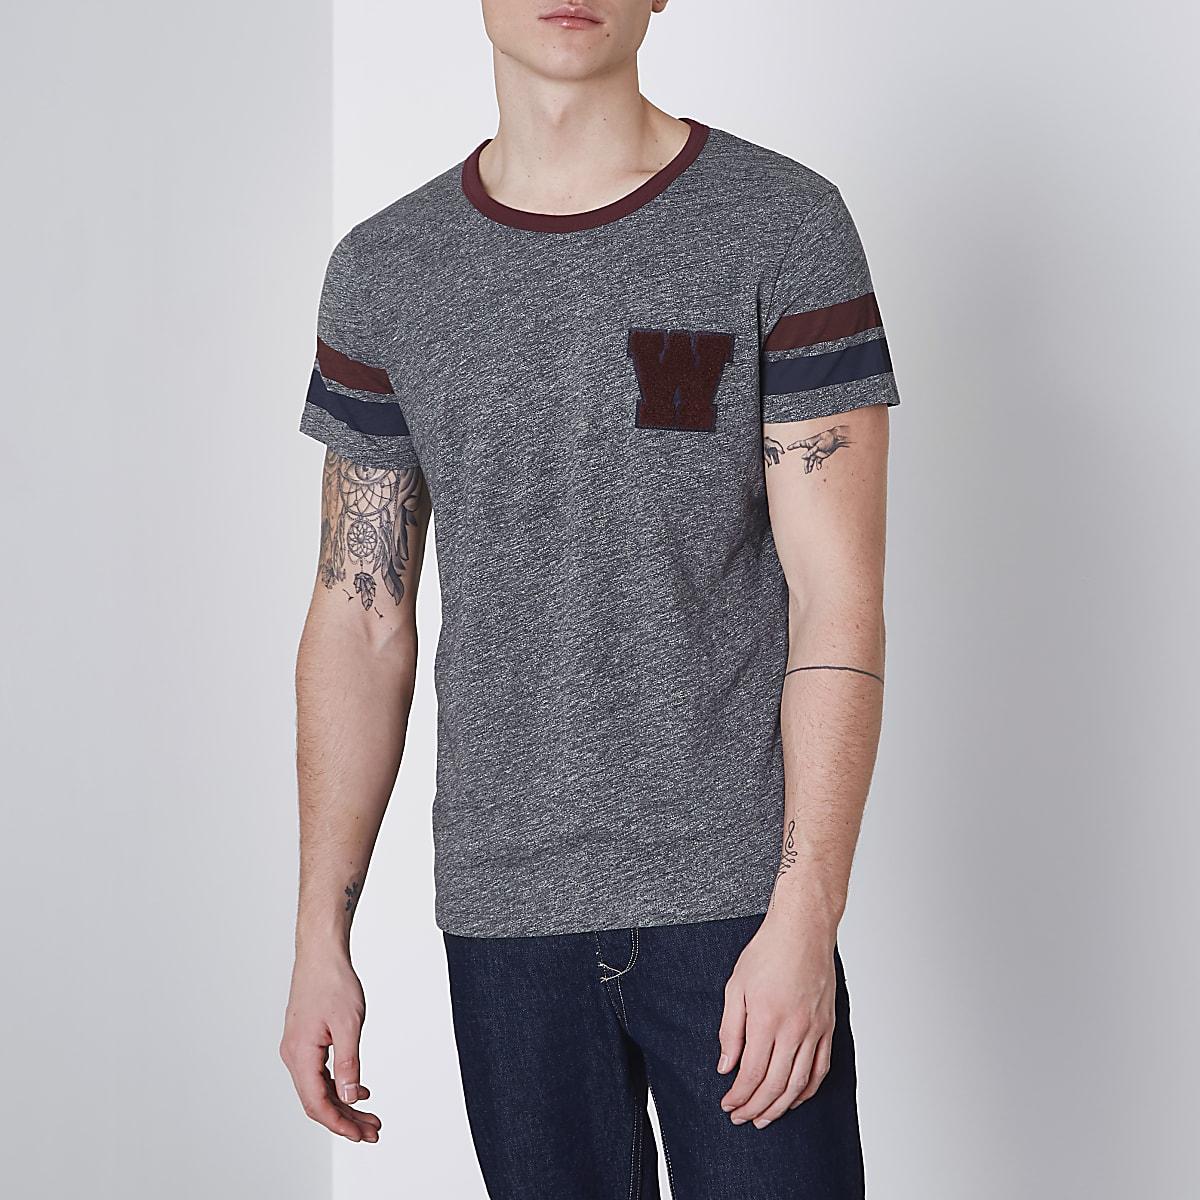 Wrangler grey short sleeve T-shirt